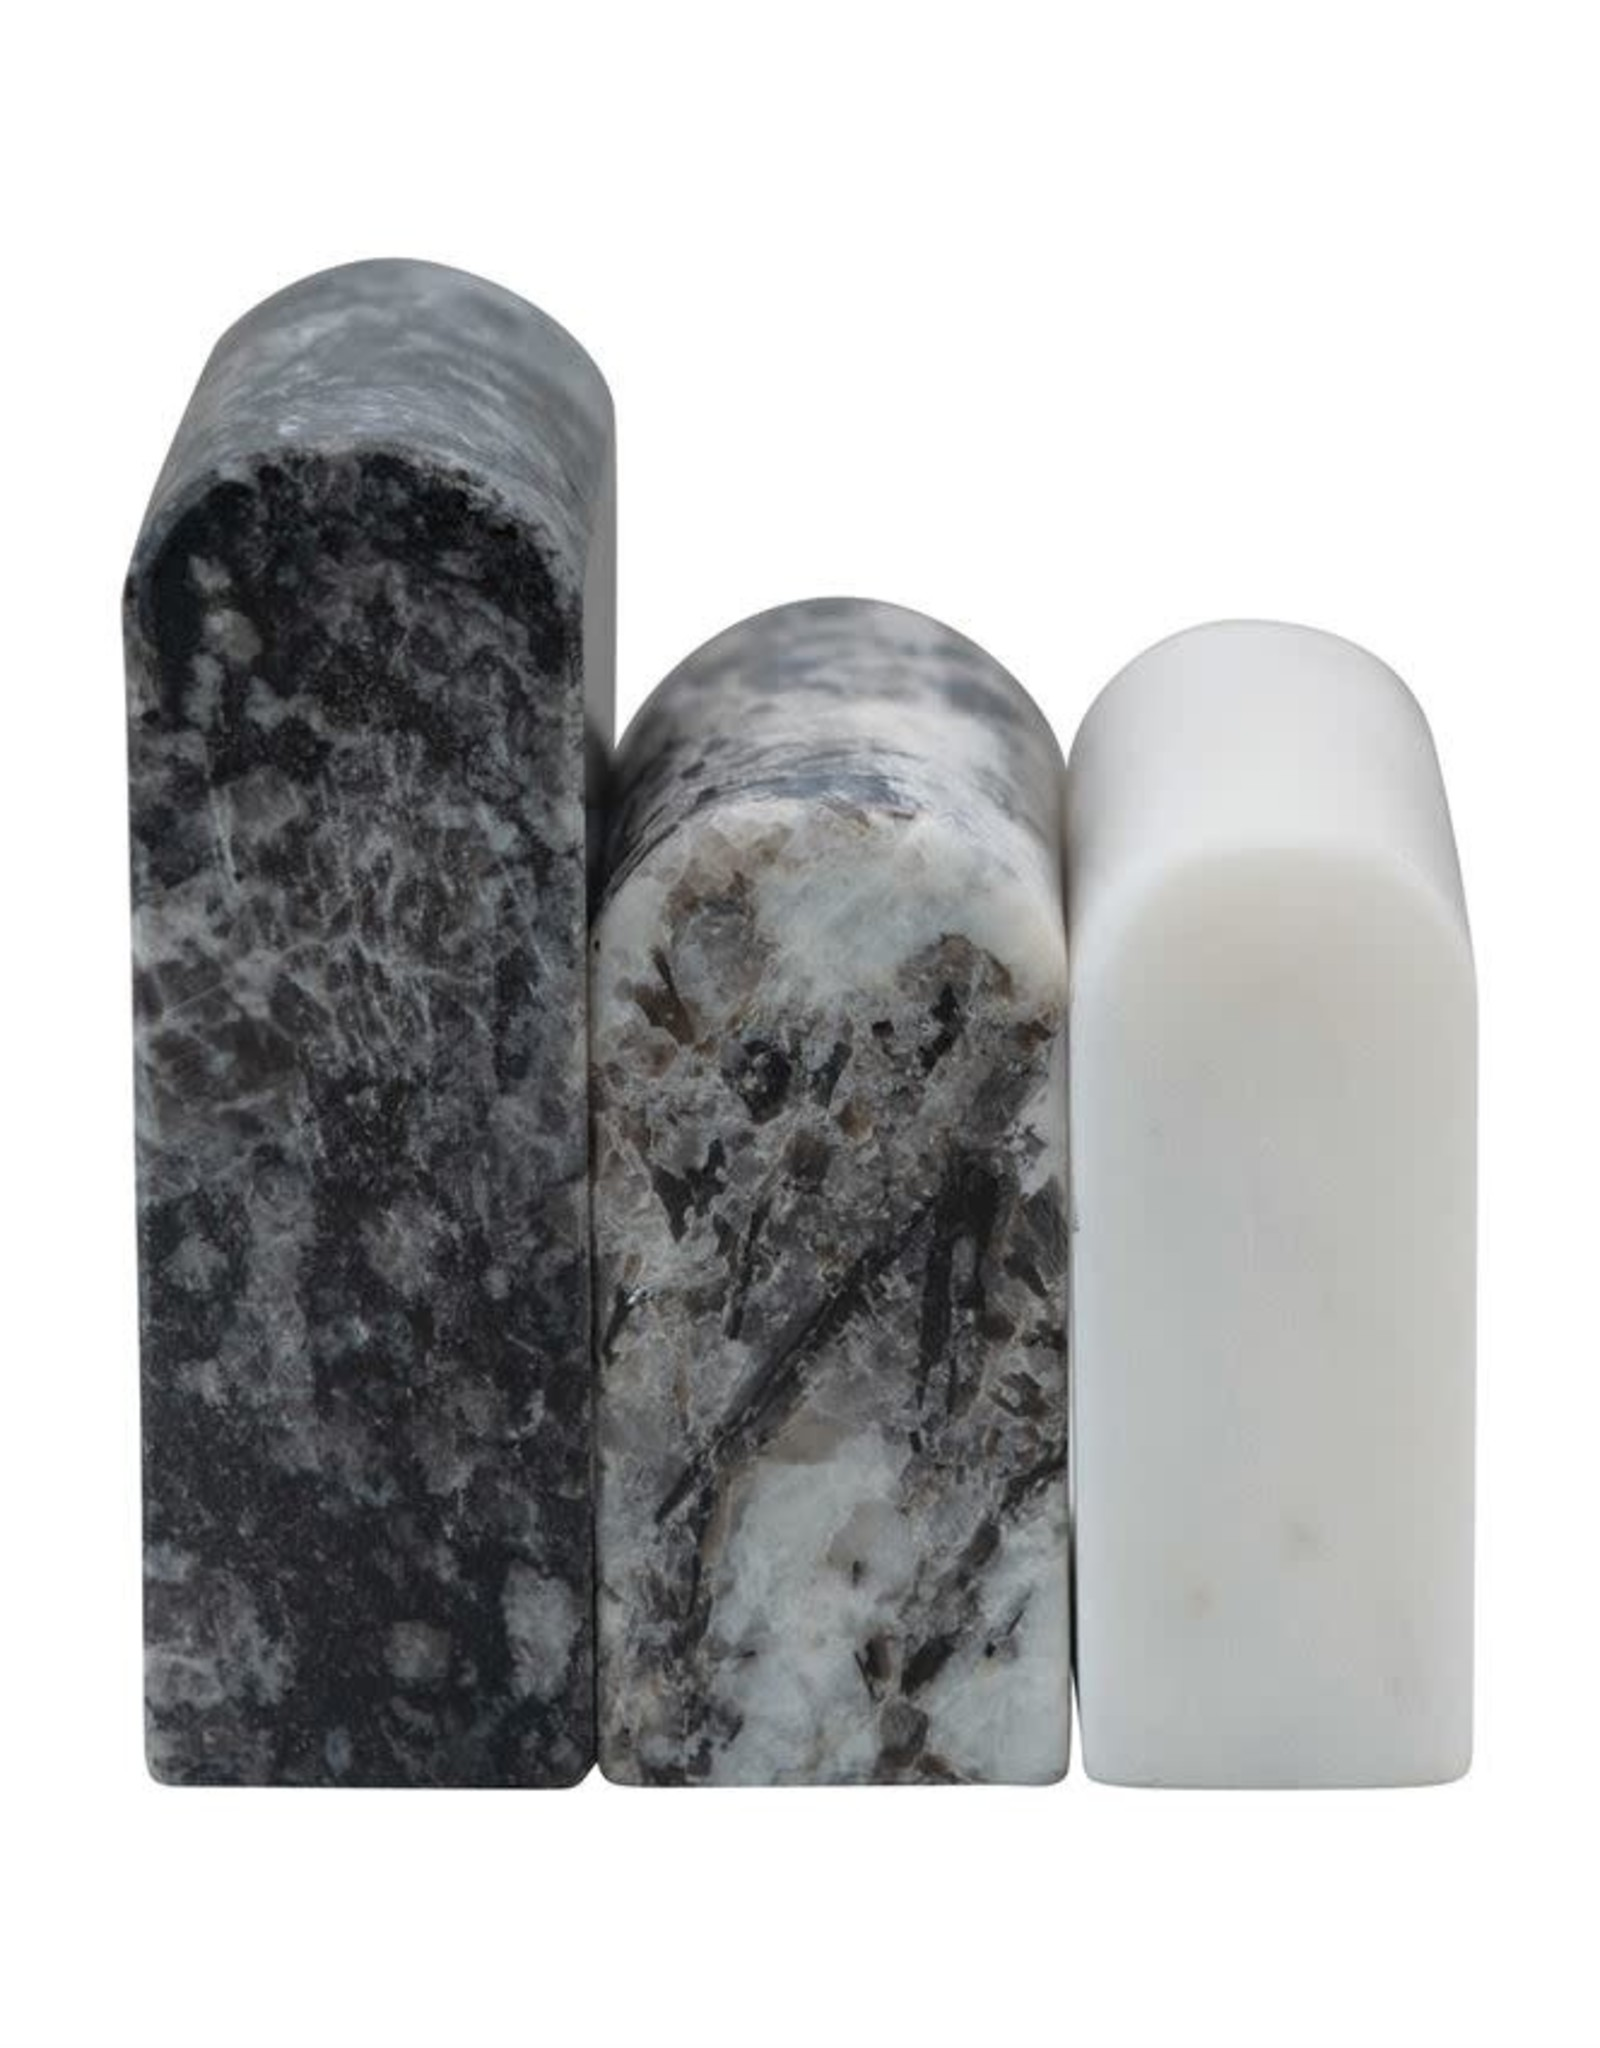 Marble Decor (Set of 3)